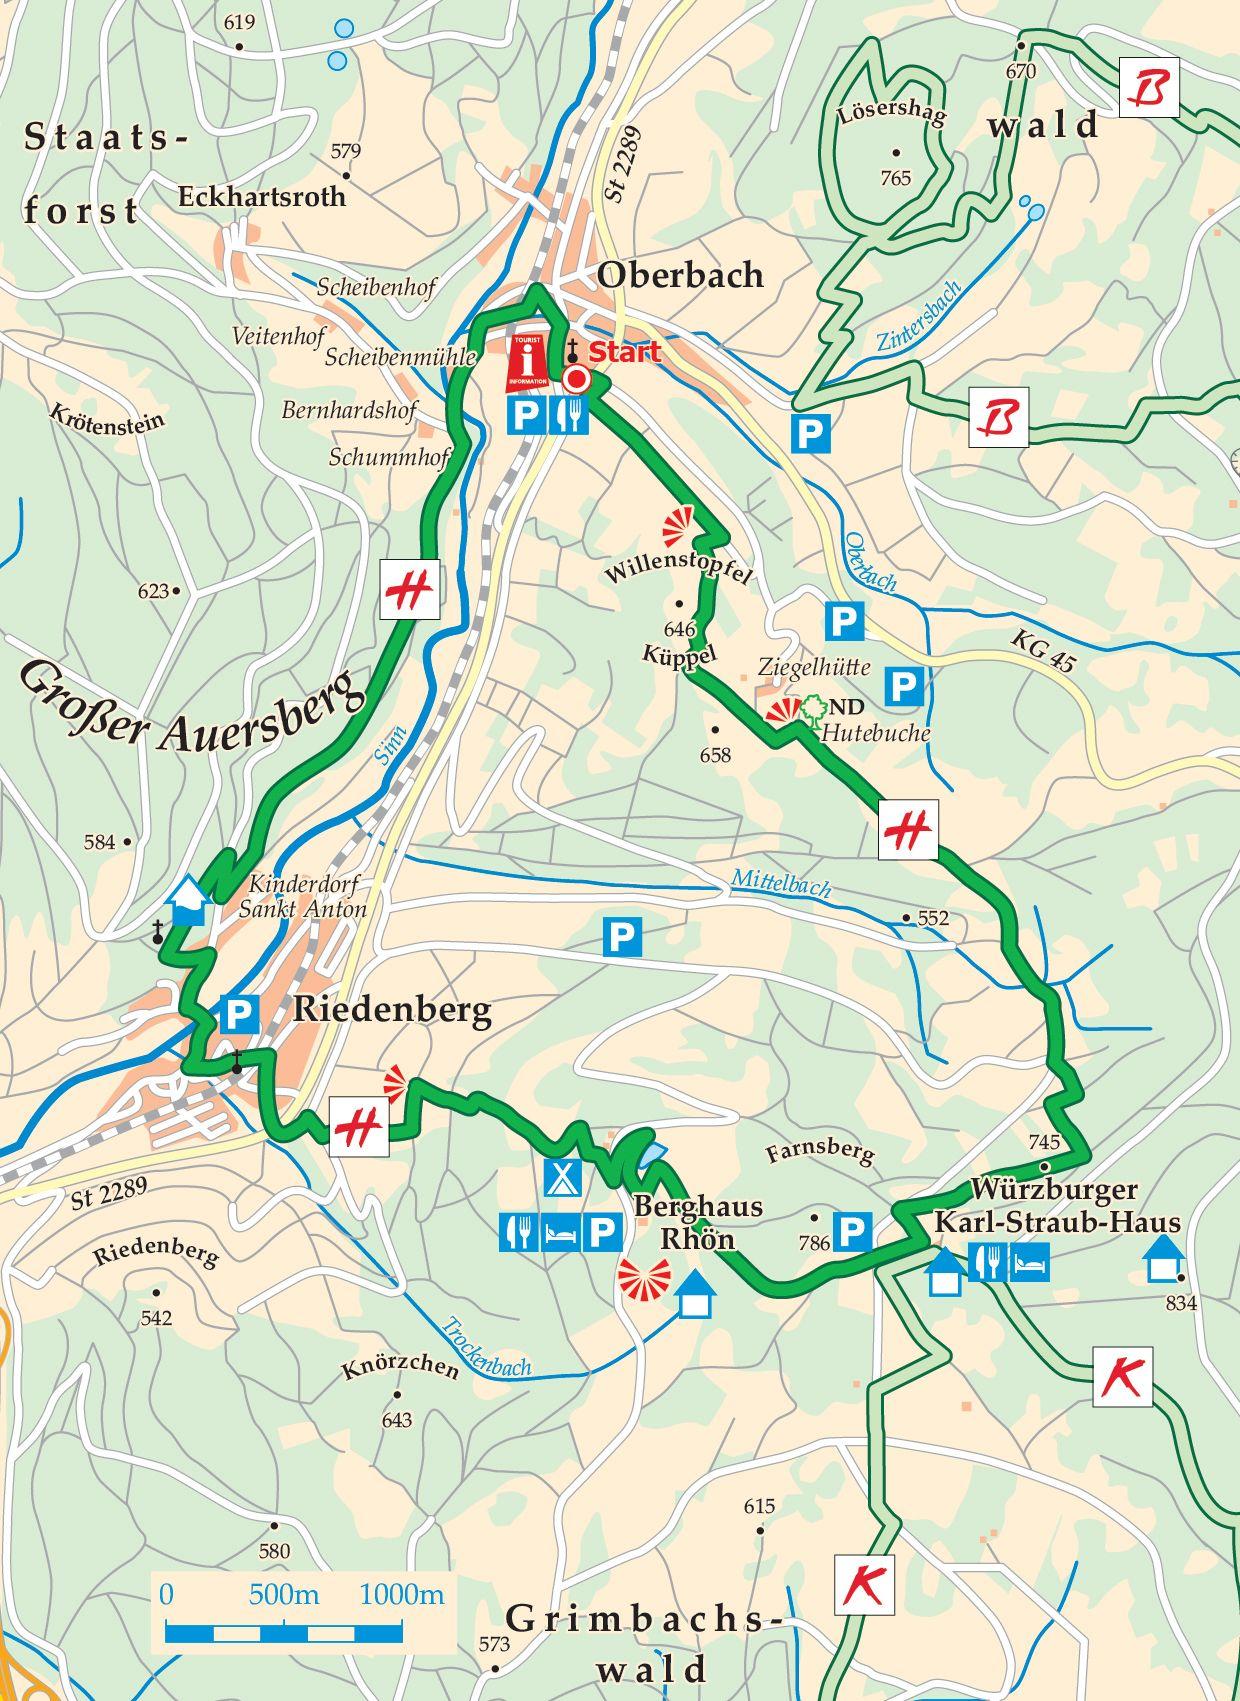 Extratour Hüttentour Karte